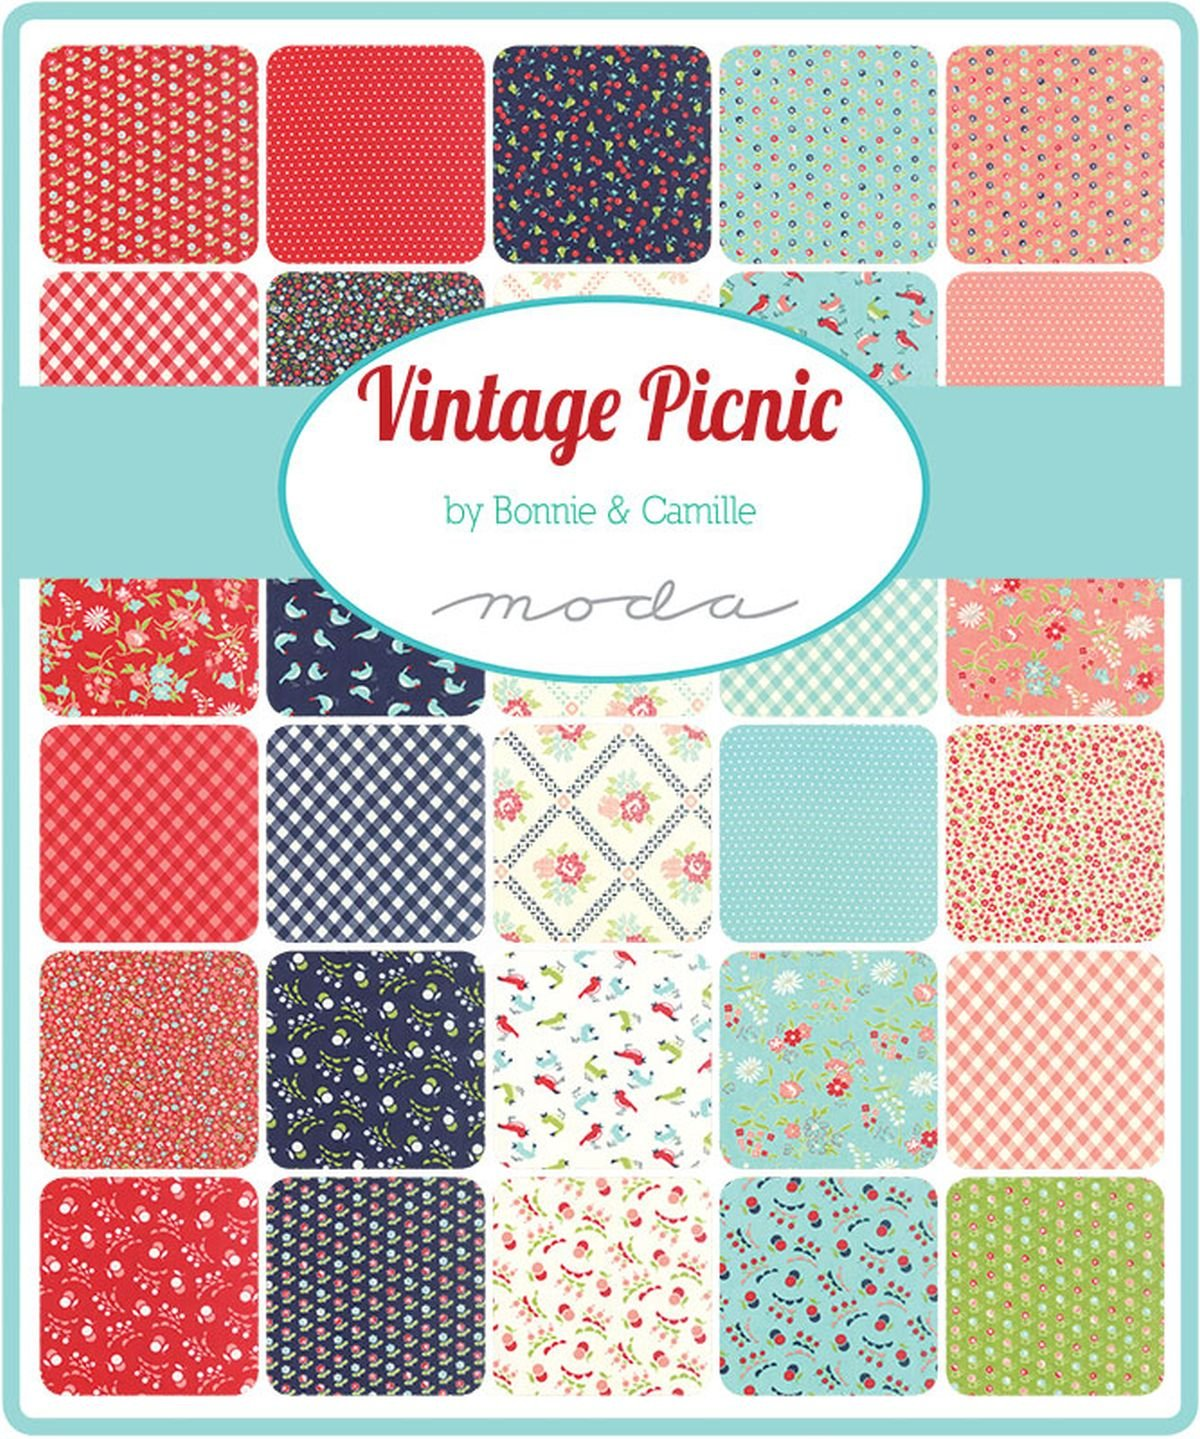 Vintage Picnic Charm Pack By Bonnie /& Camille; 42-5 Precut Fabric Quilt Squares